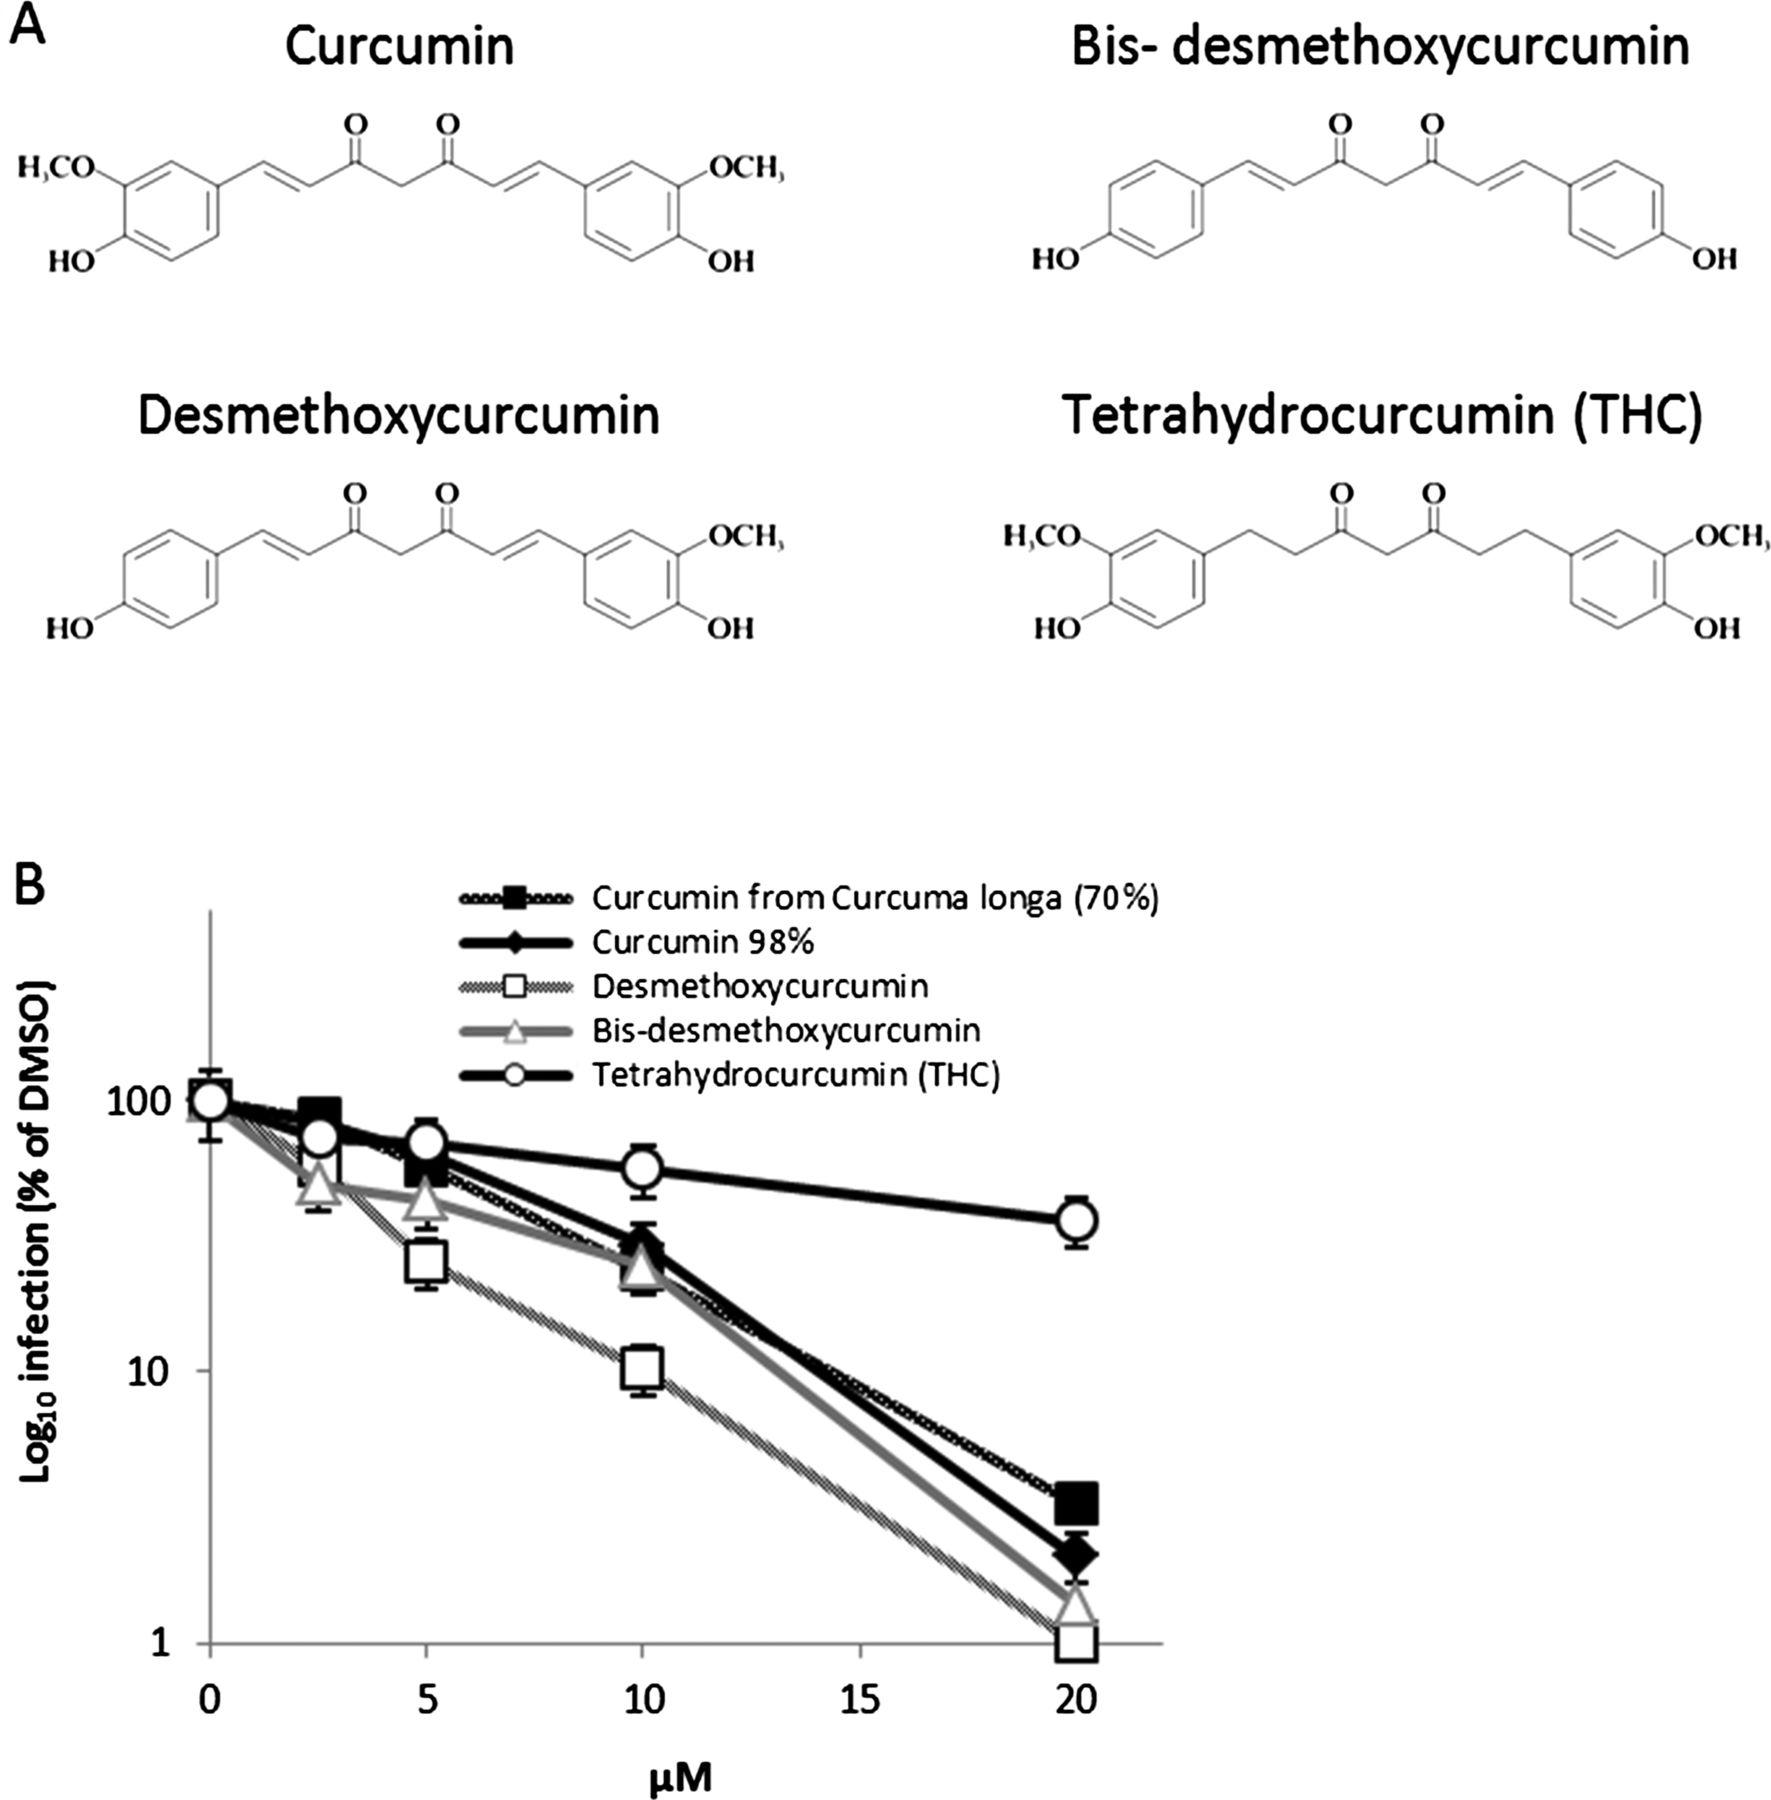 Turmeric curcumin inhibits entry of all hepatitis C virus genotypes